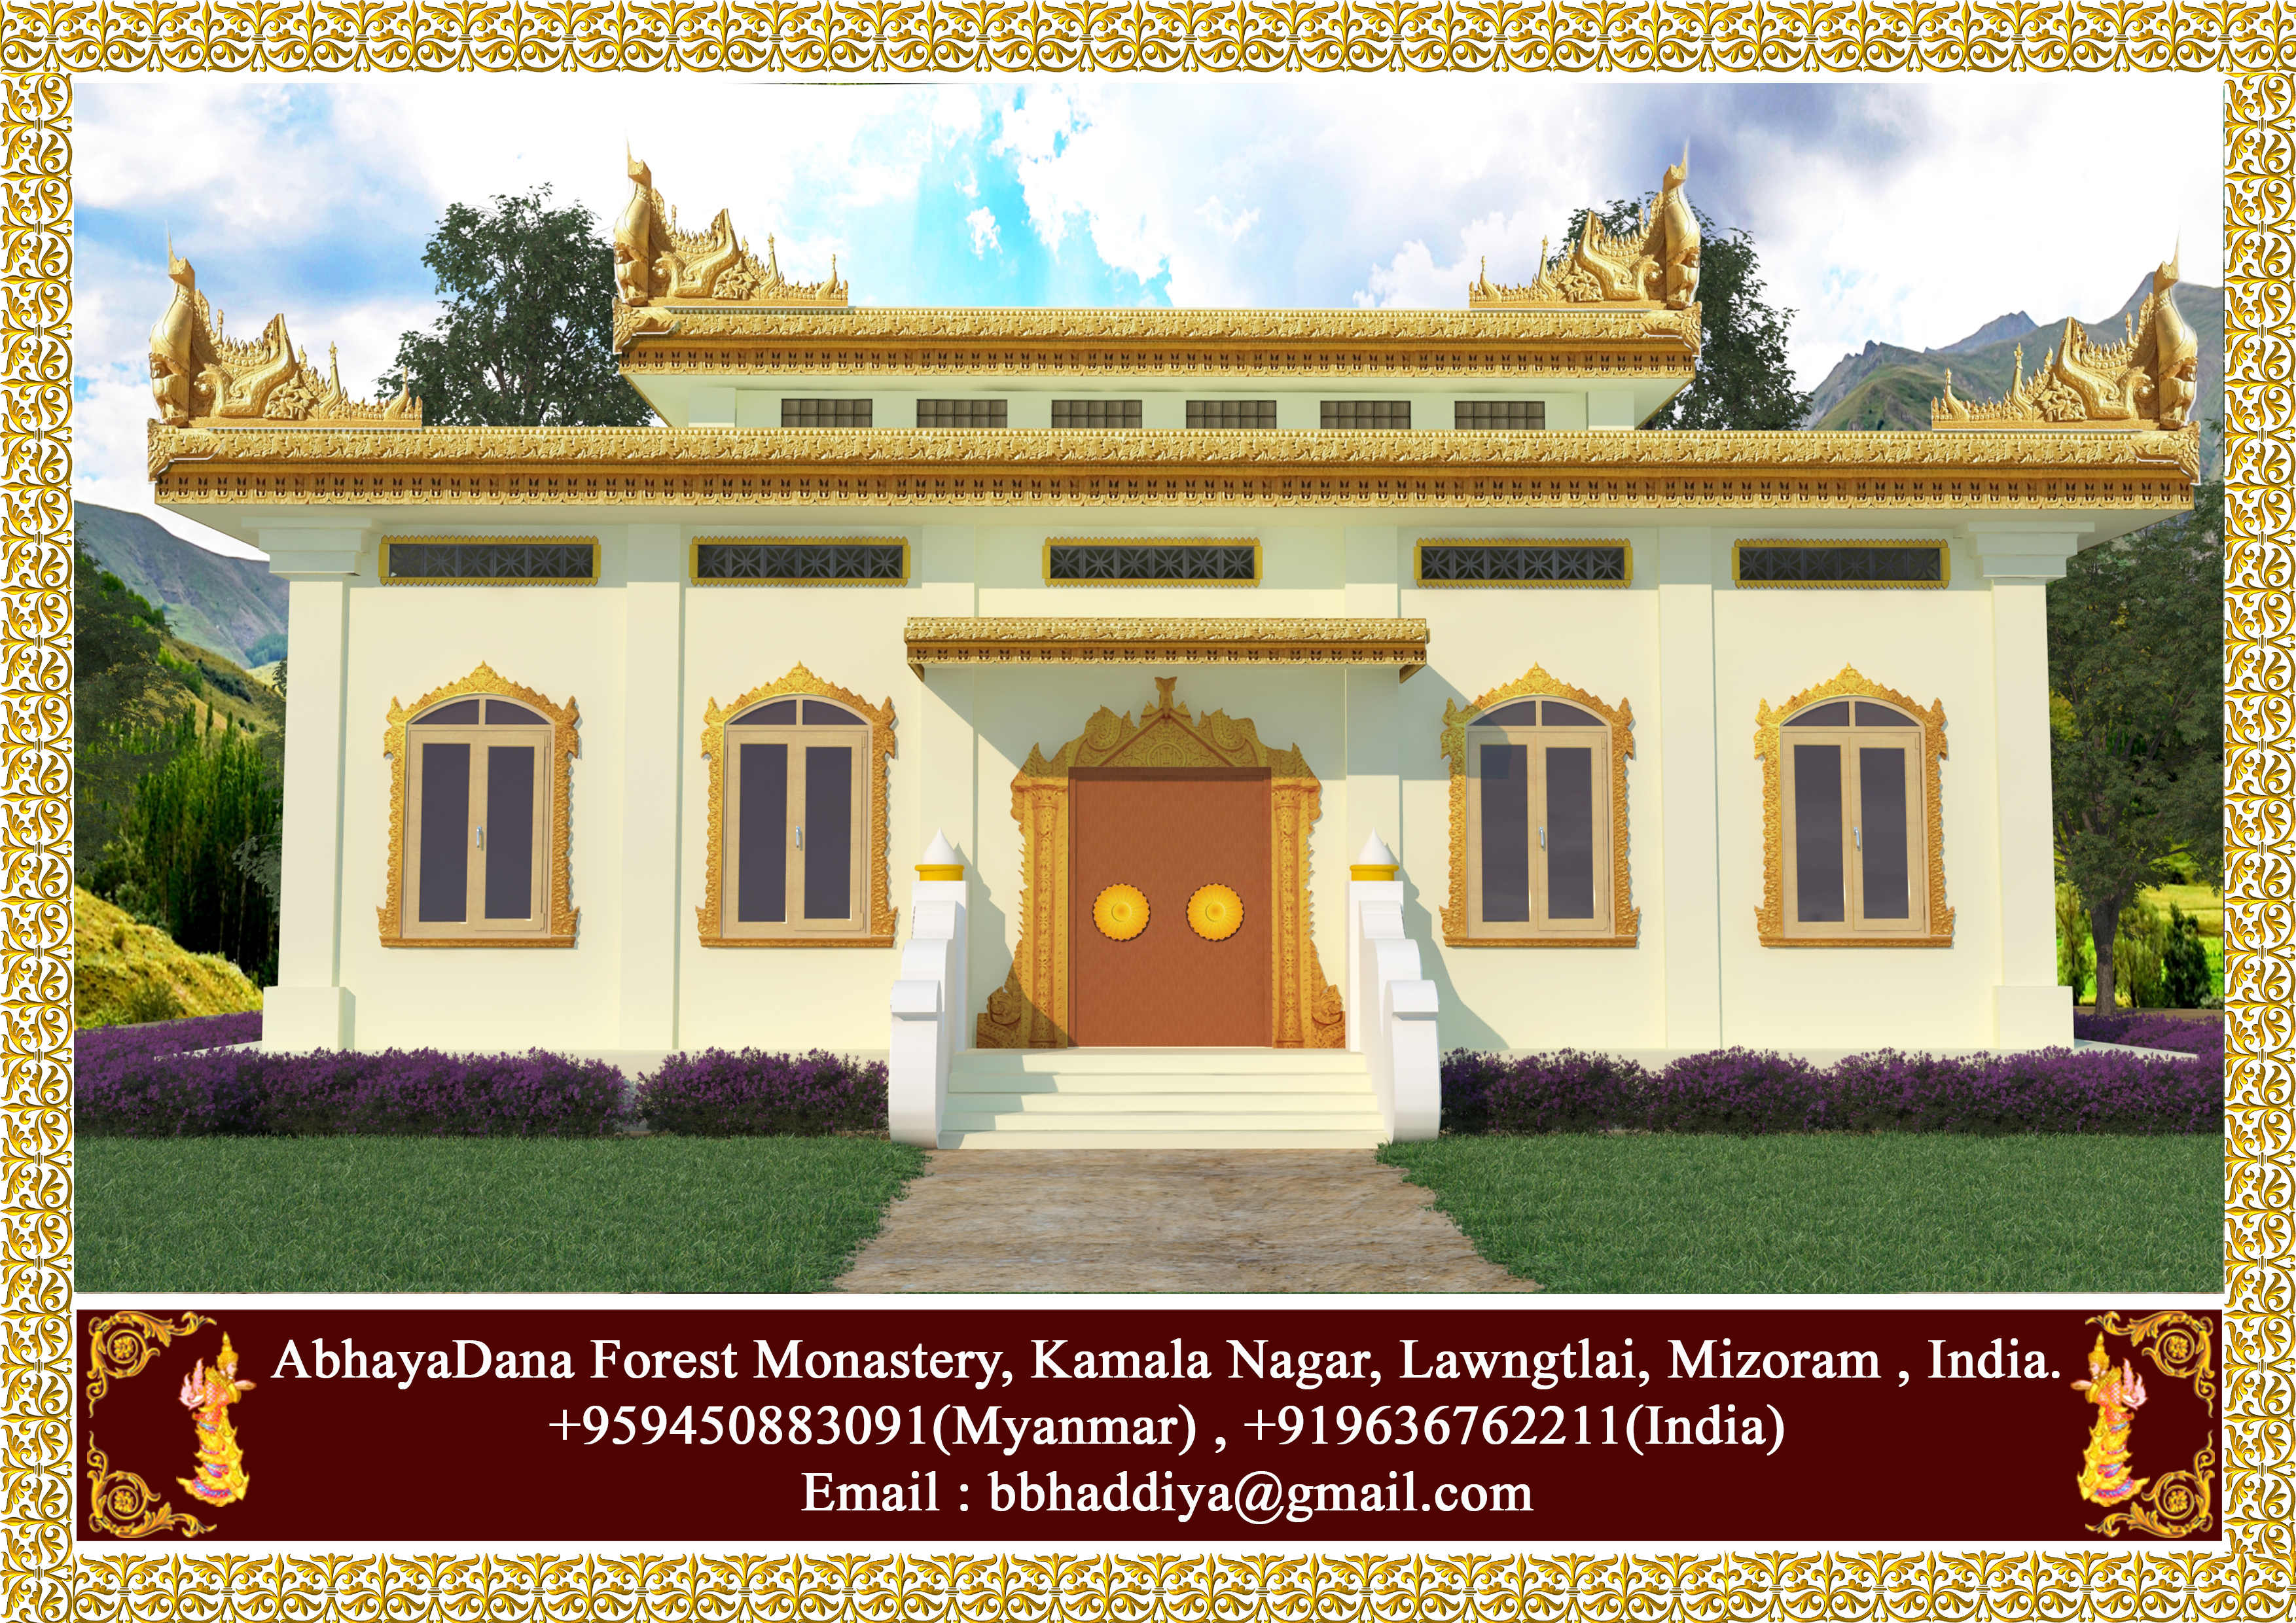 Mizoram Monasetry